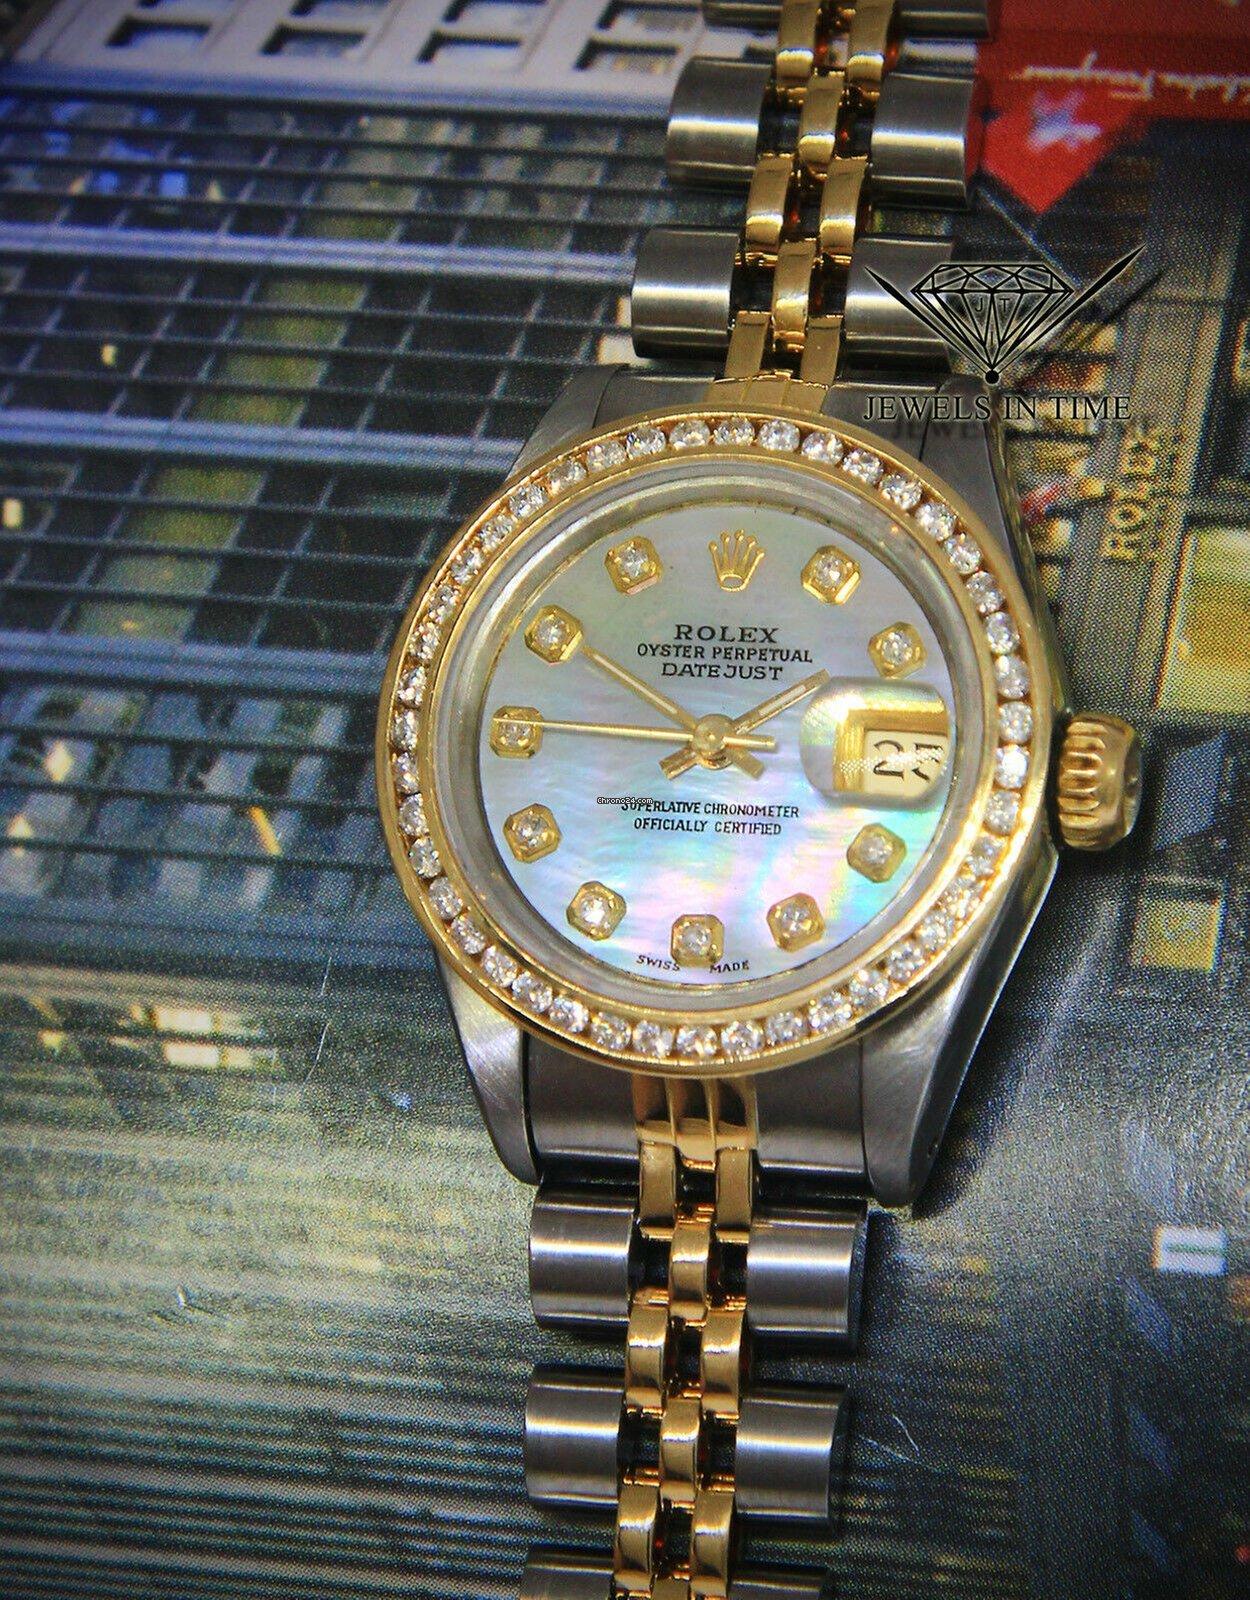 91f9f37715d Rolex Datejust 18k Yellow Gold/Steel MOP Diamond Dial/Bezel Ladies Watch  69173